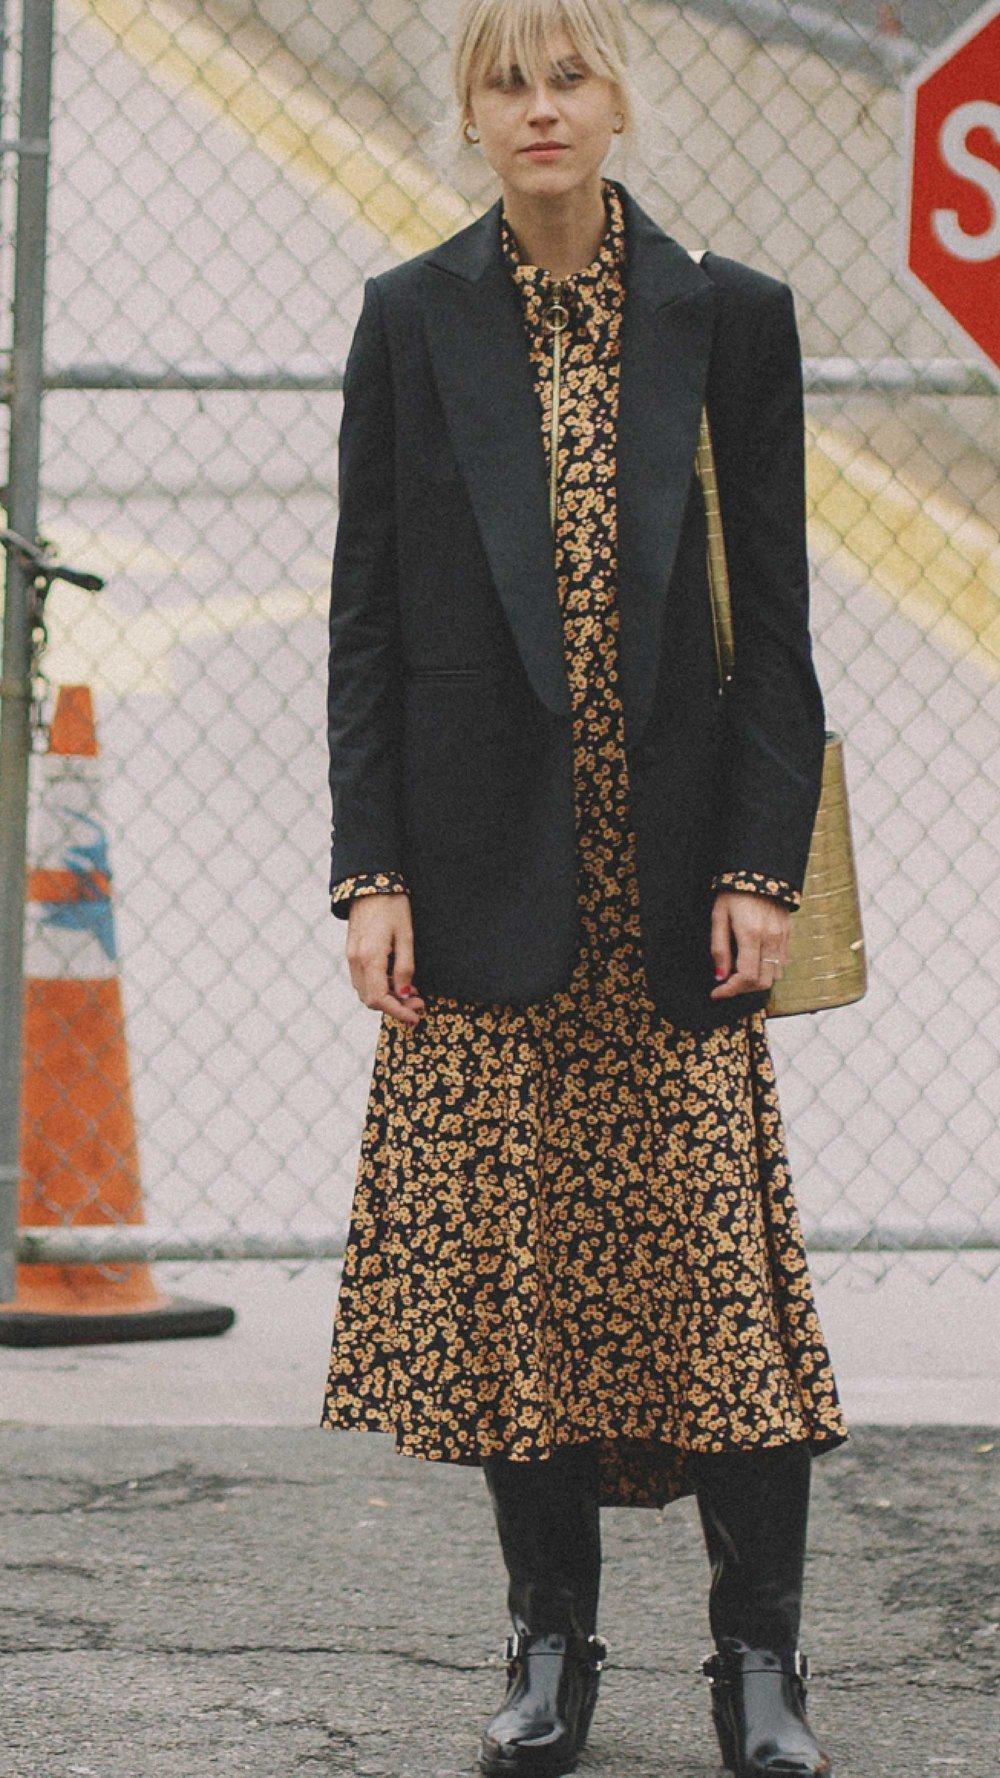 New-York-Fashion-Week-NYFW-SS18-street-style-day-five-SS18-12.jpg